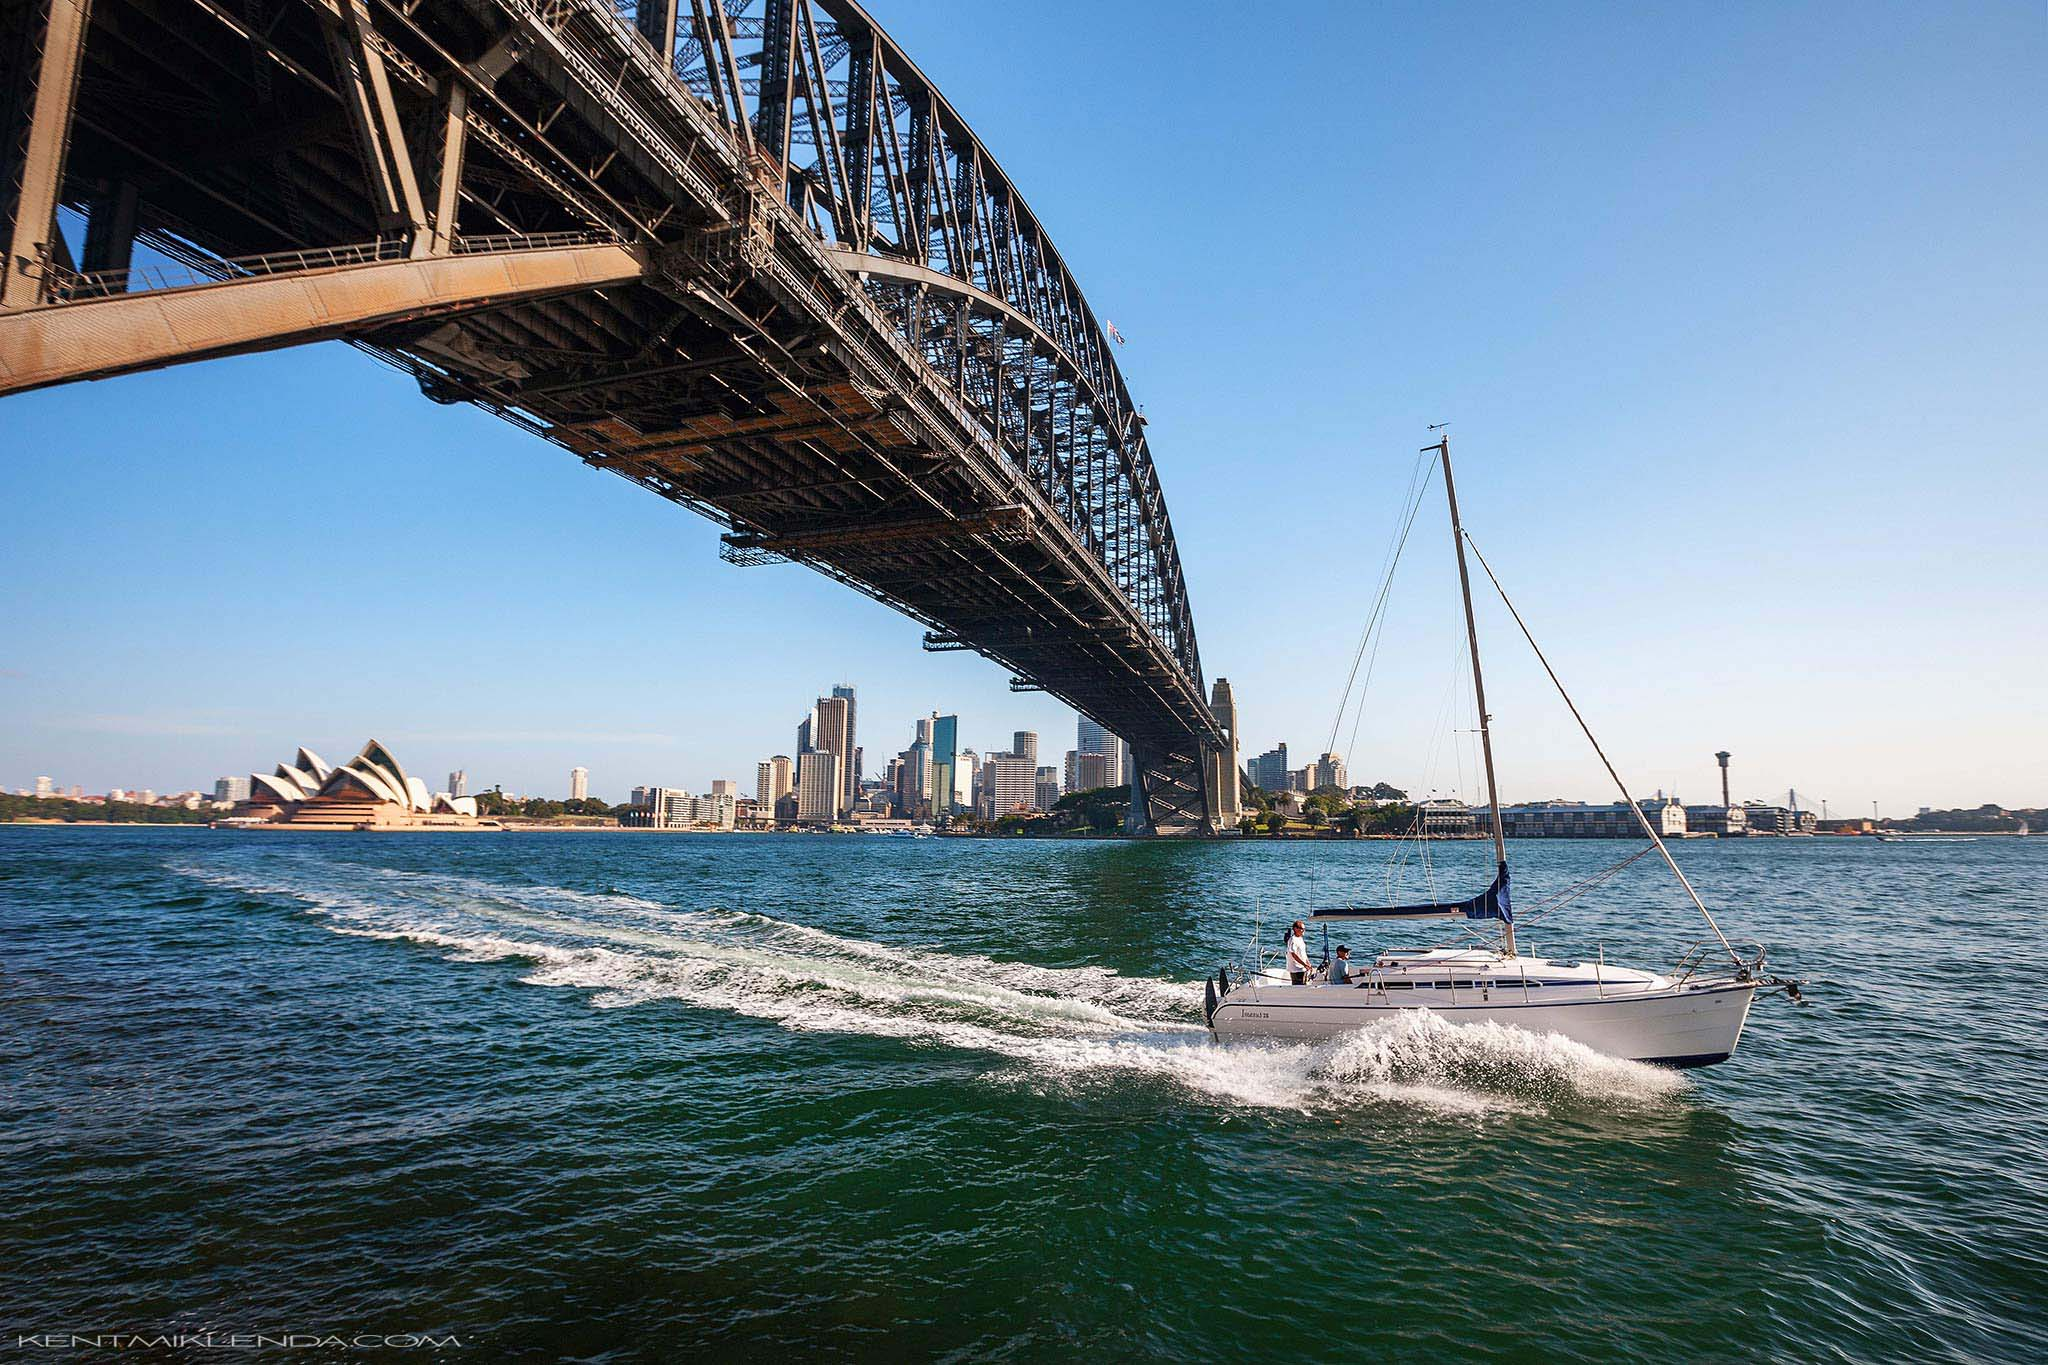 Imexus-28-in-Sydney-Harbour-2048x1365-KM.jpg